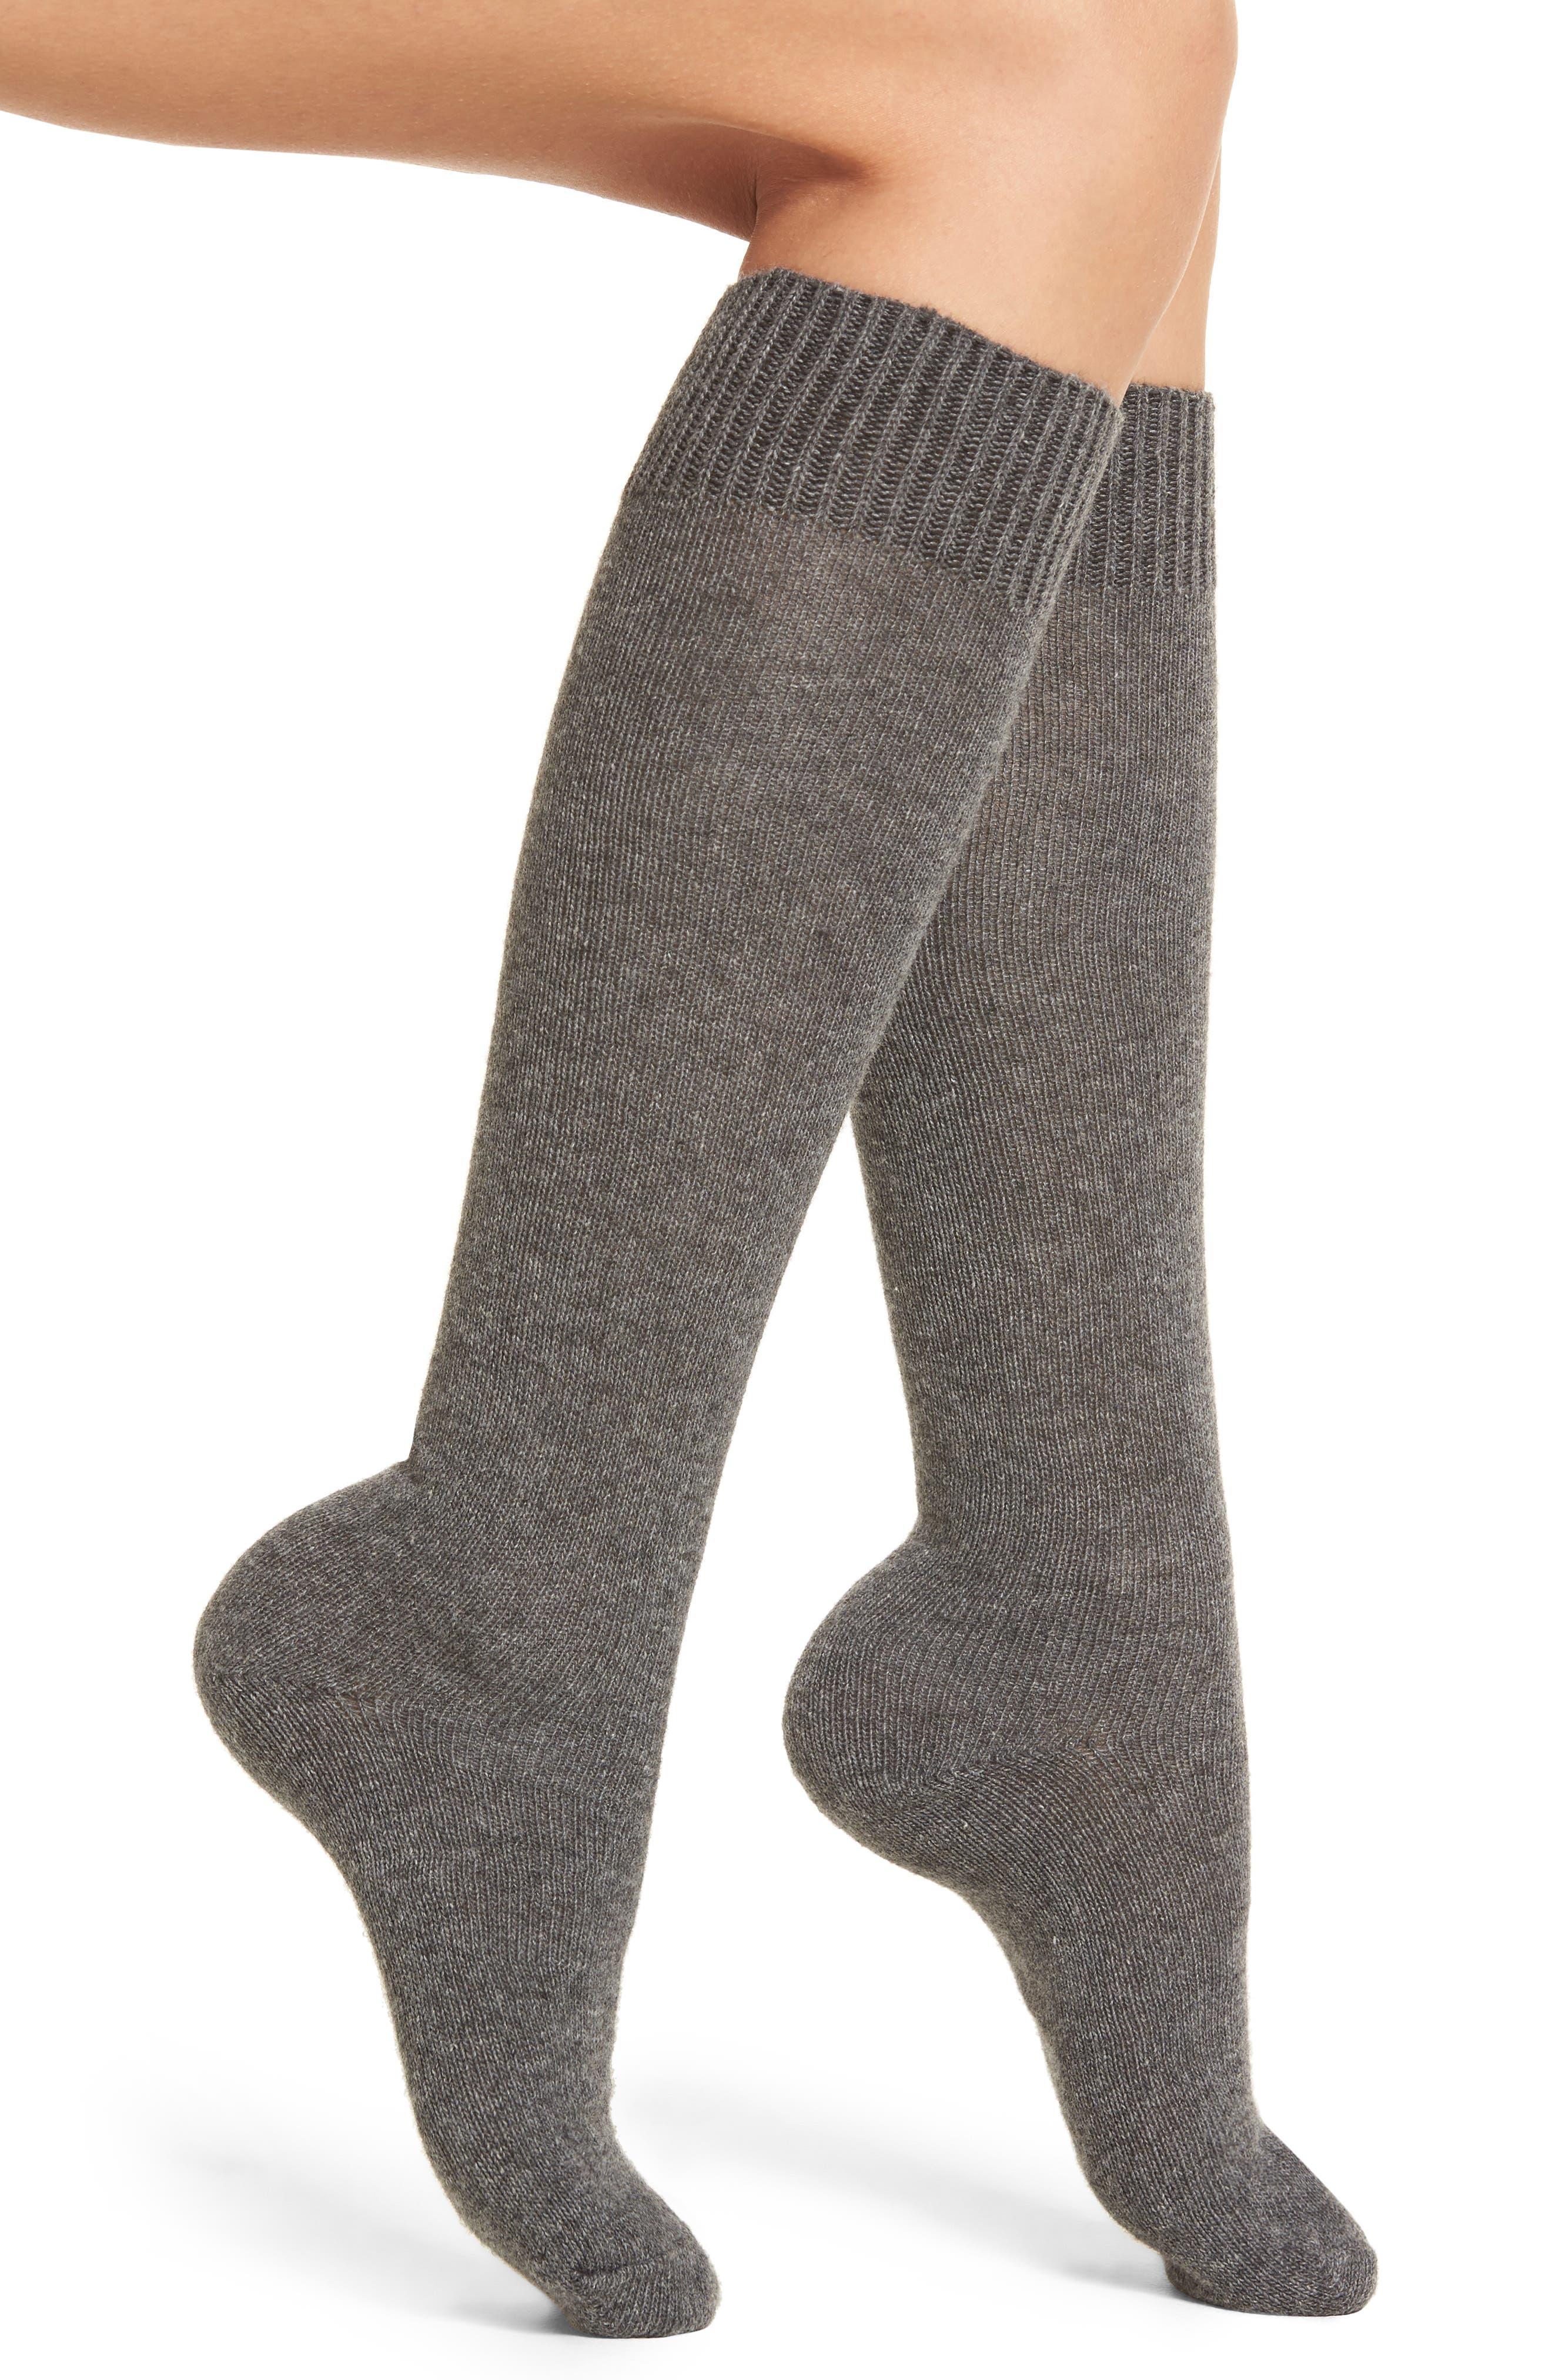 Knee High Socks,                             Main thumbnail 1, color,                             Charcoal